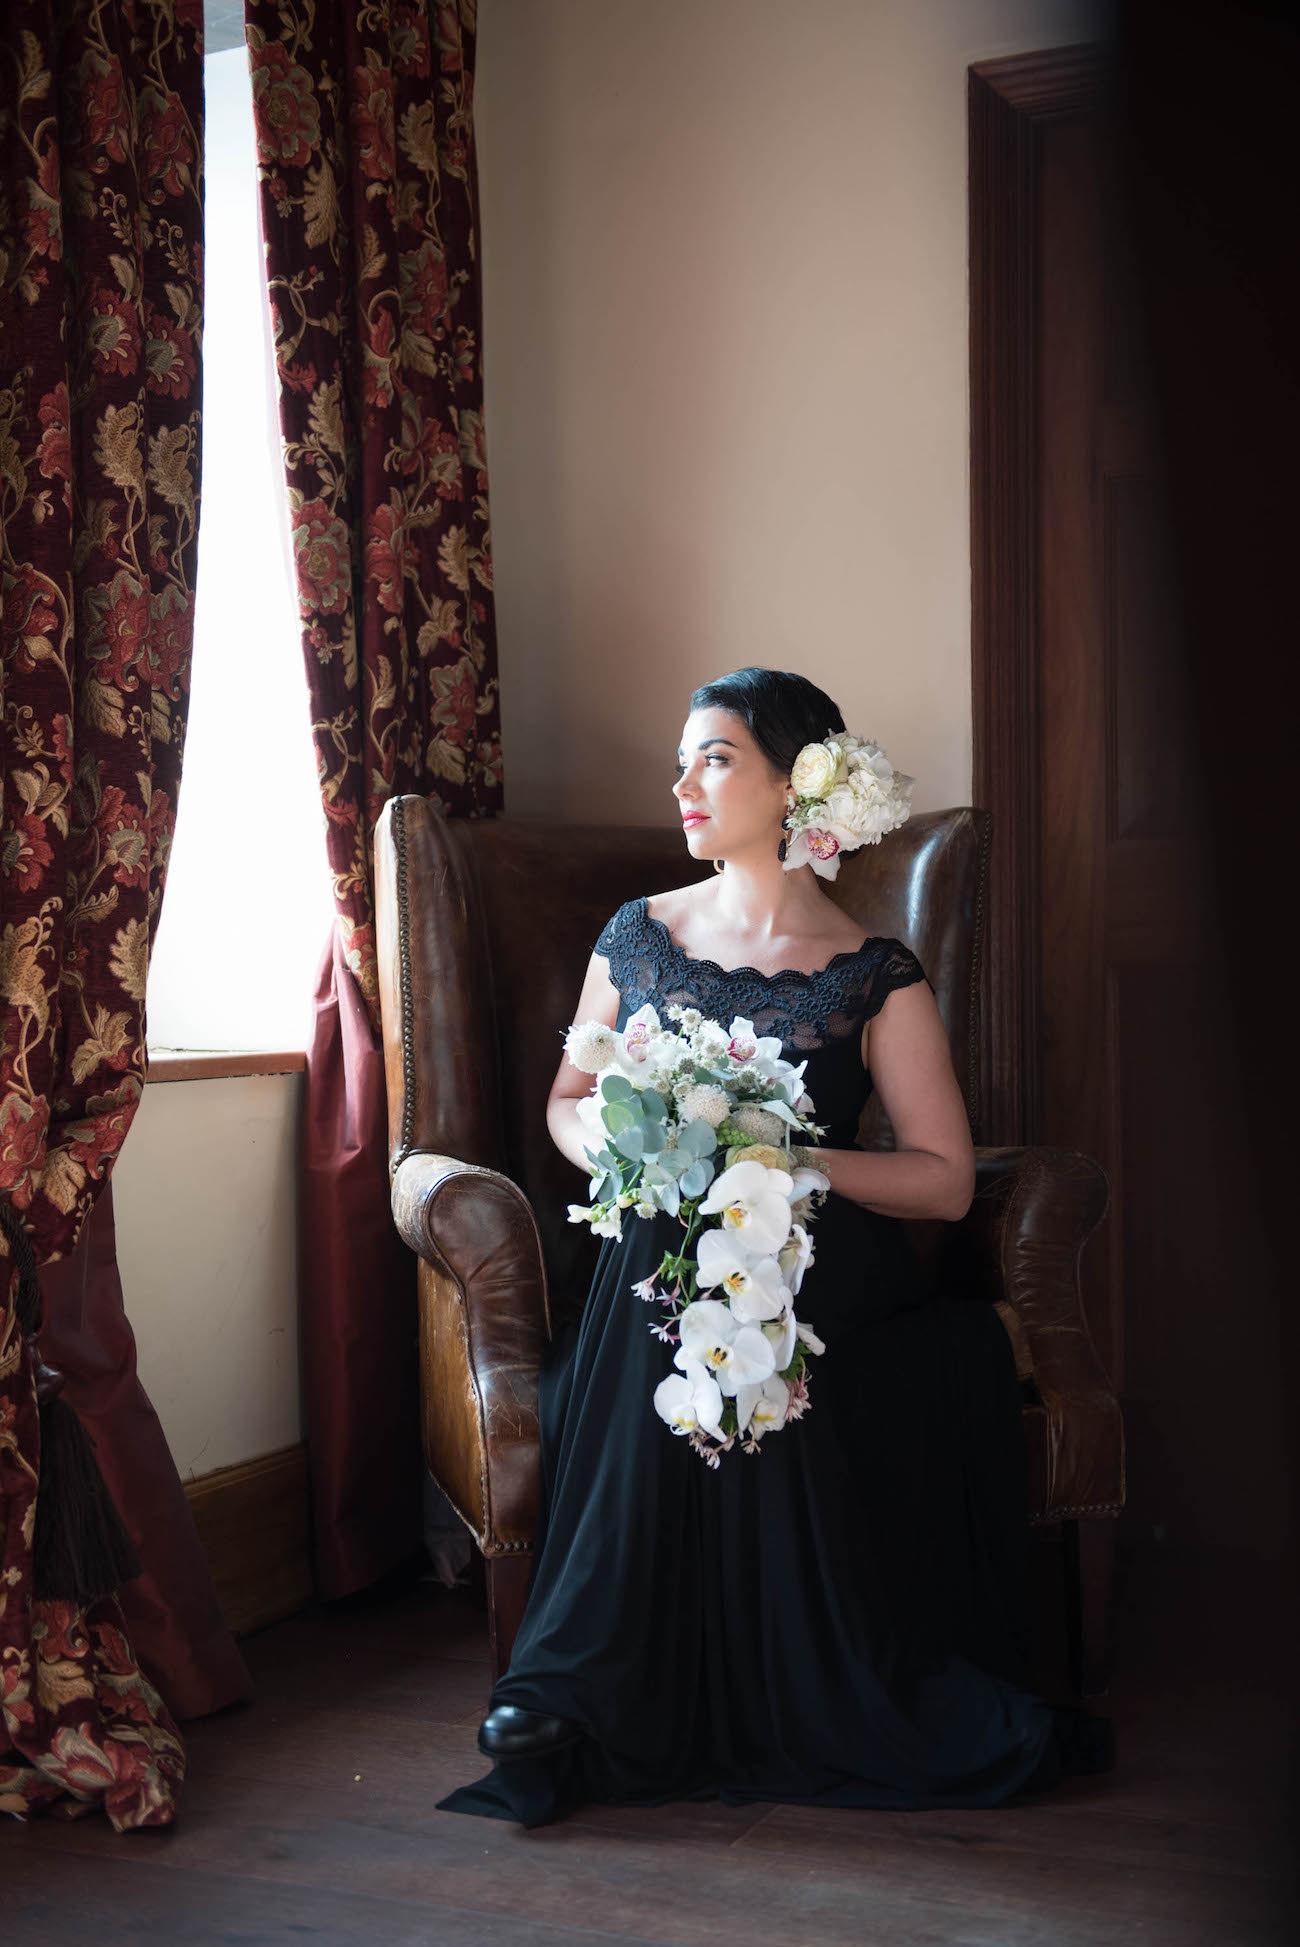 Black Lace Wedding or Bridesmaid Dress | Credit: Jacoba Clothing/Forever September